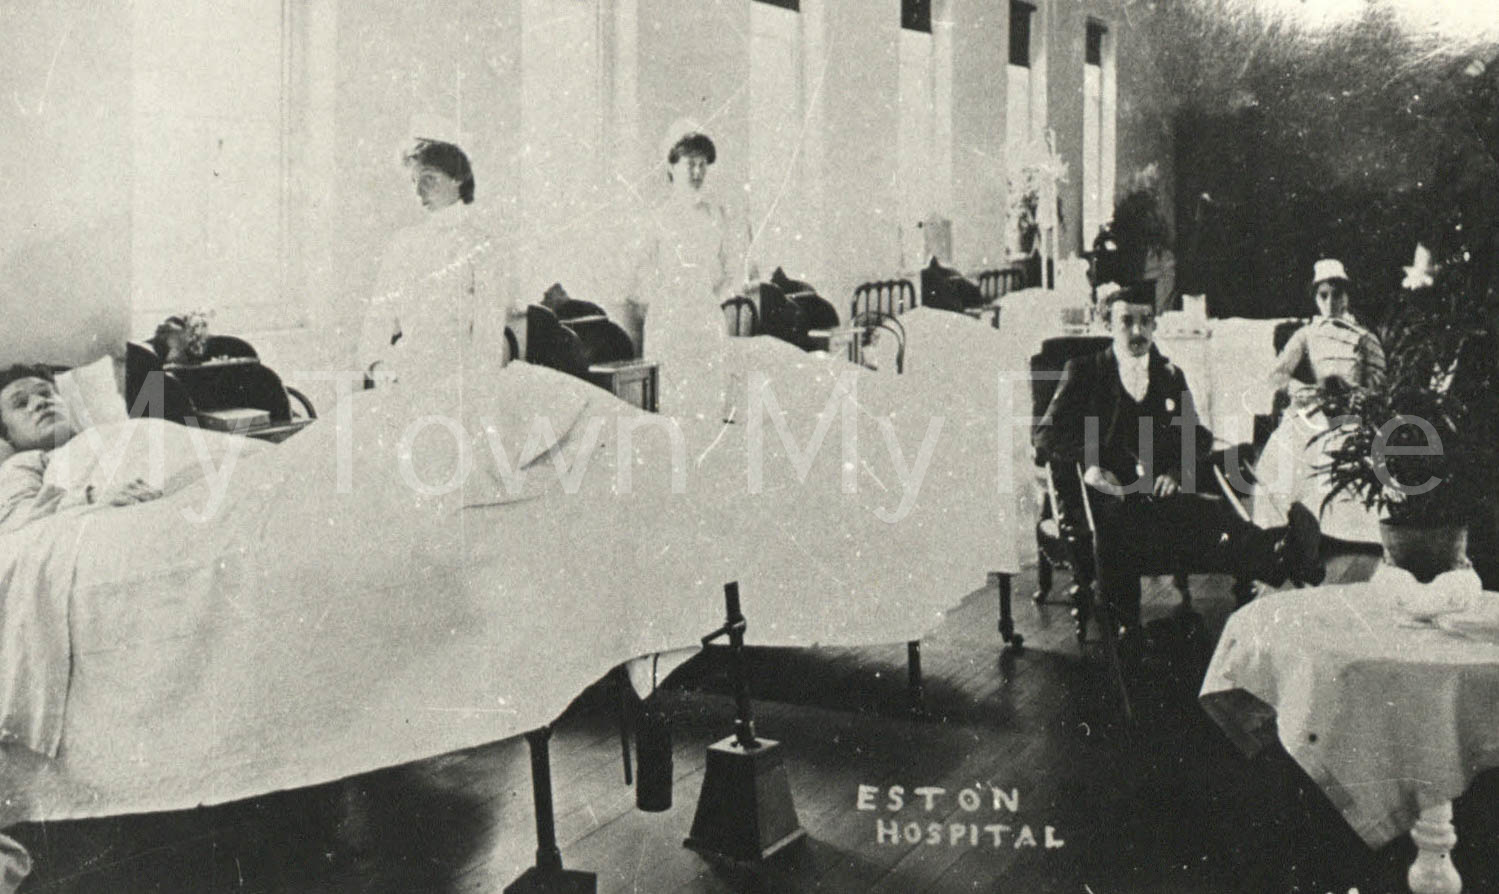 Eston Hospital ward 1900